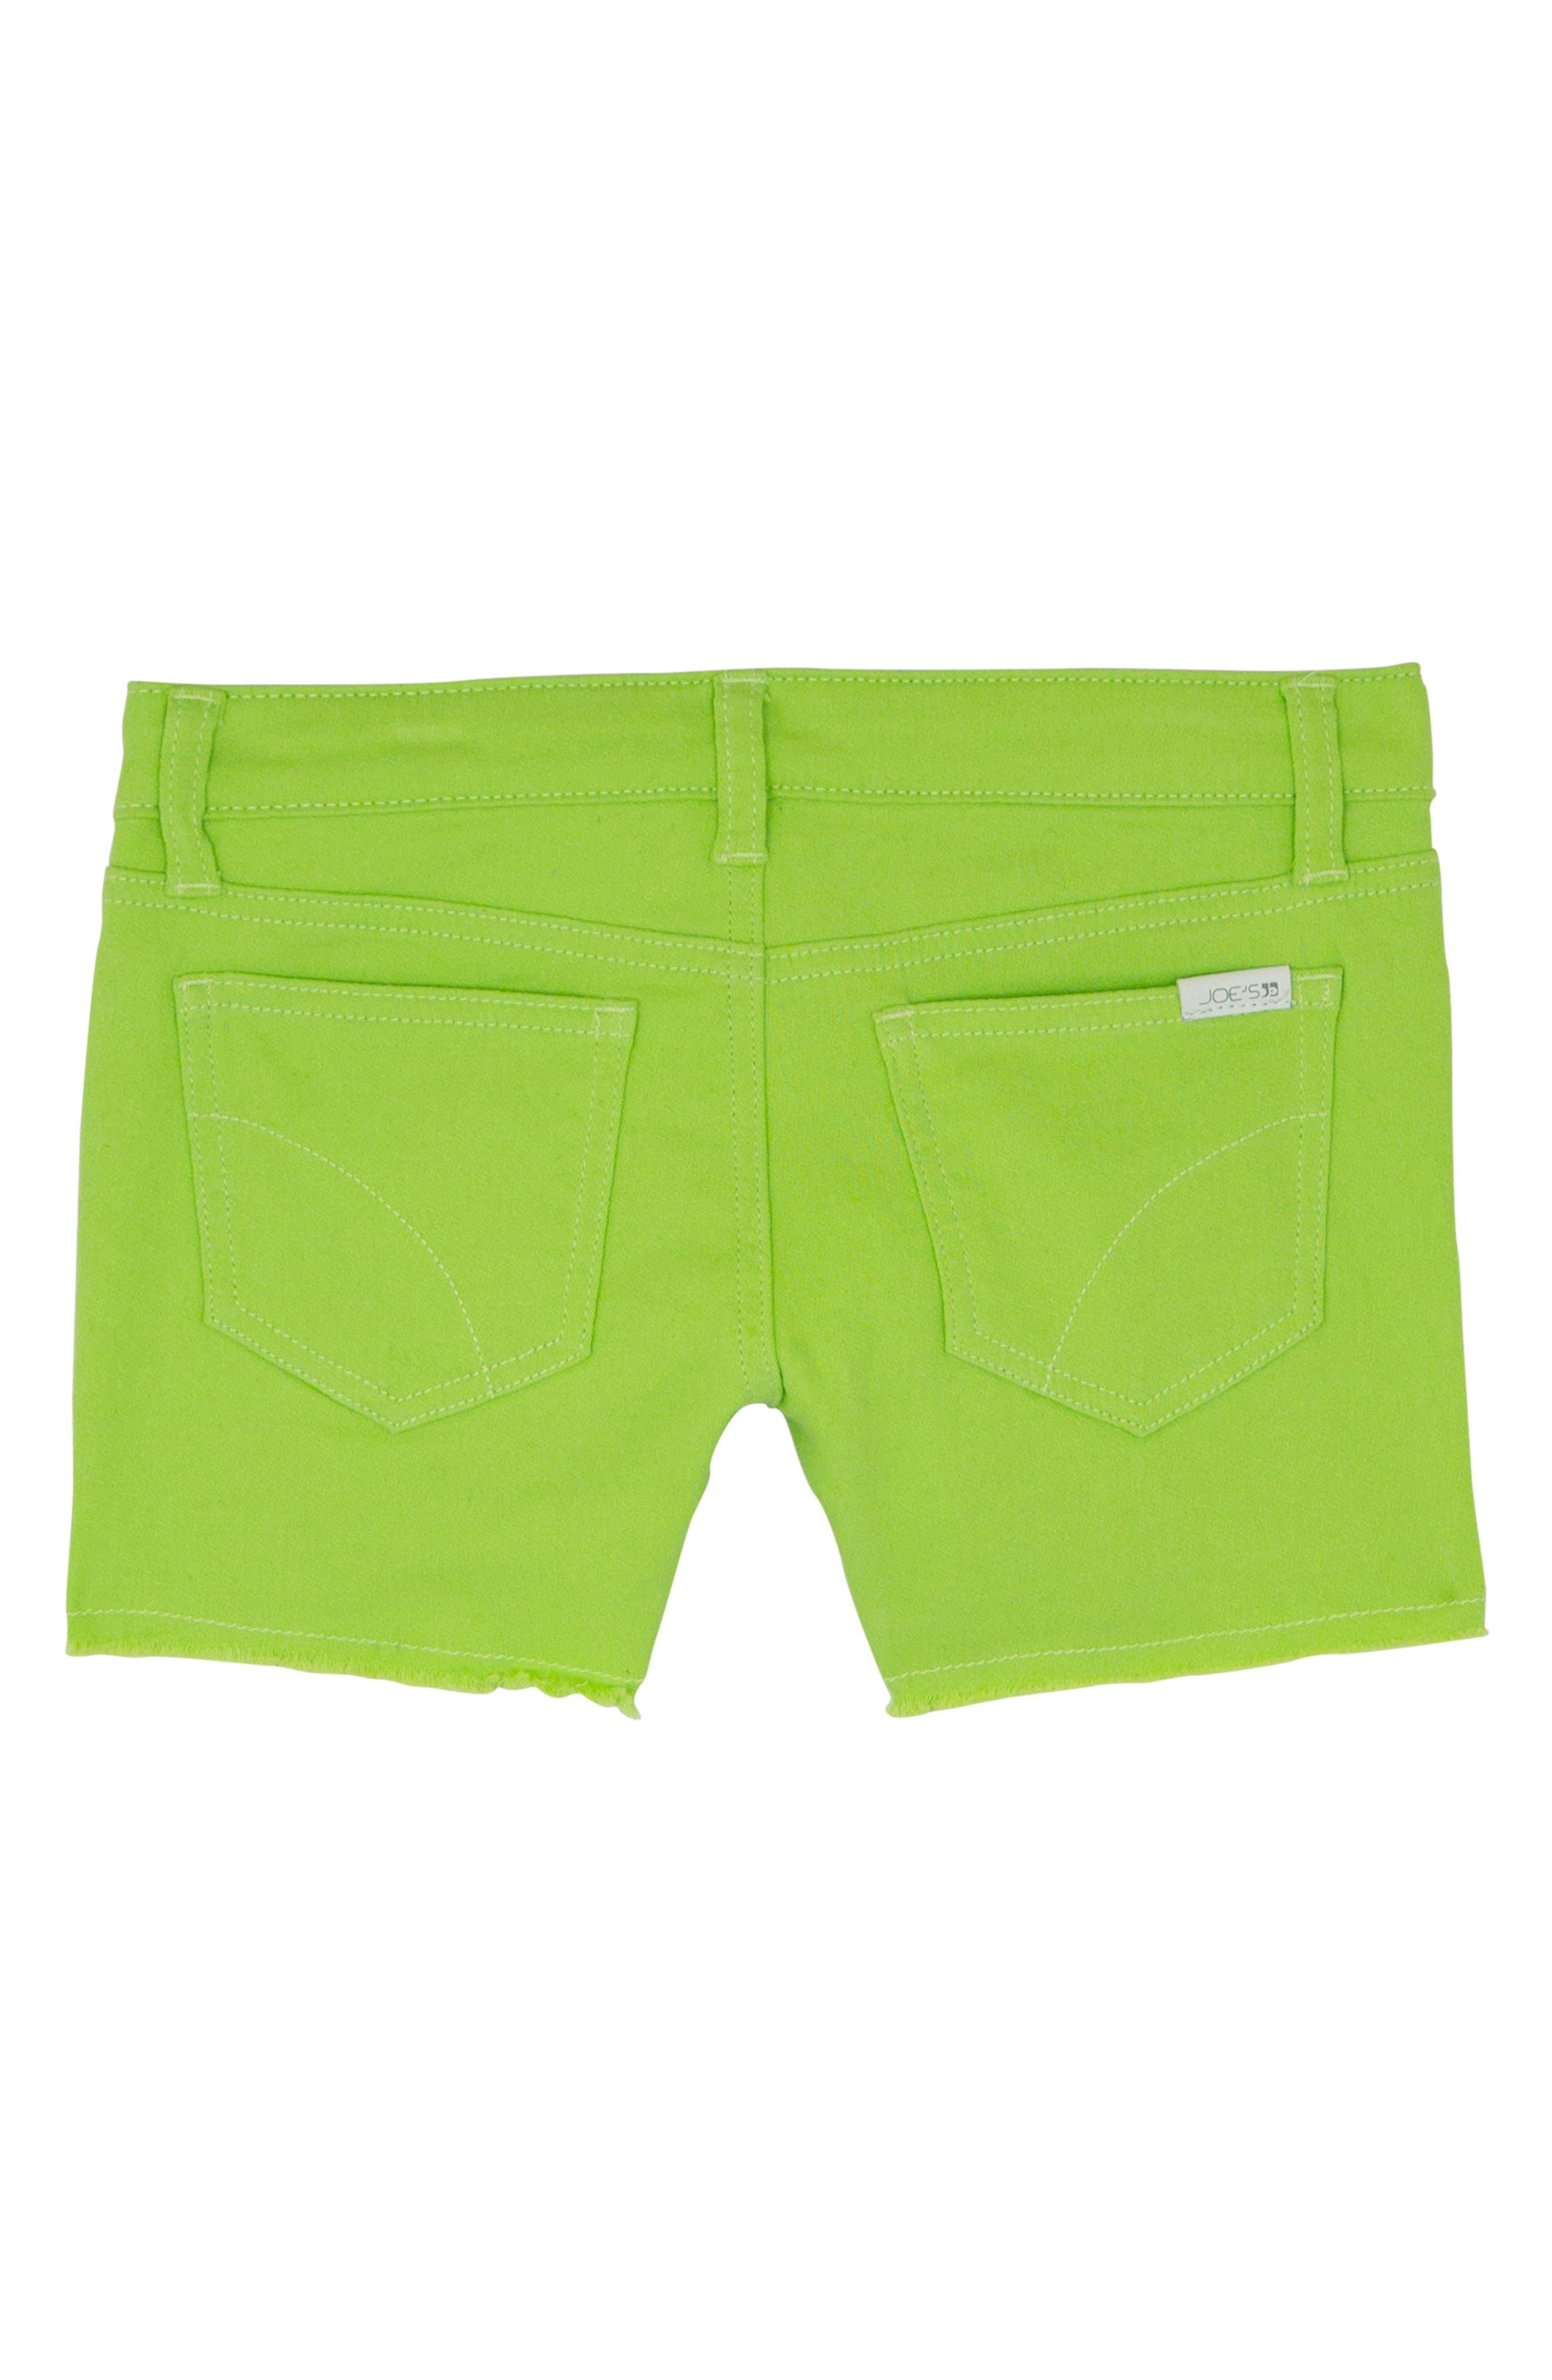 Frayed Cotton Shorts,                             Alternate thumbnail 2, color,                             360